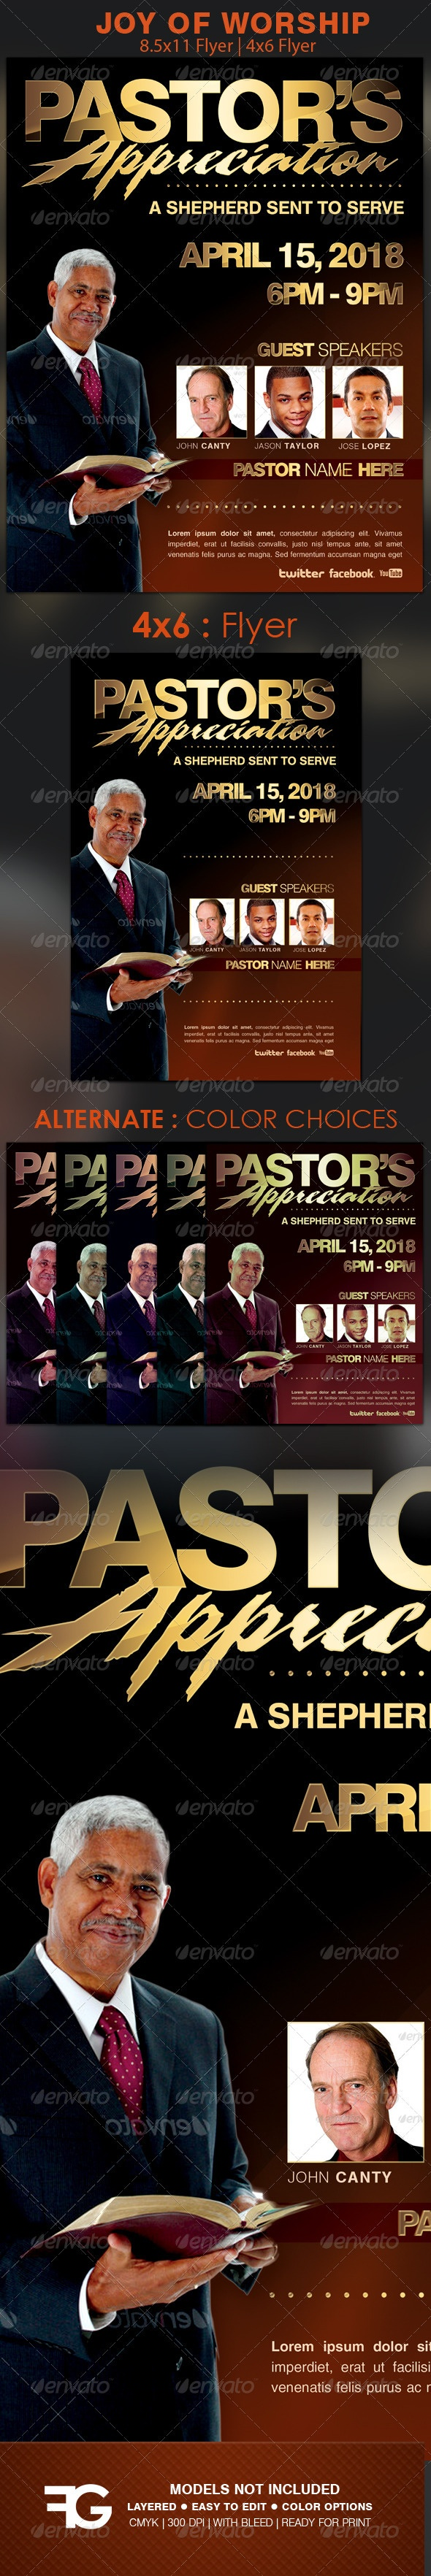 Pastors Appreciation Church Flyer Template The 14